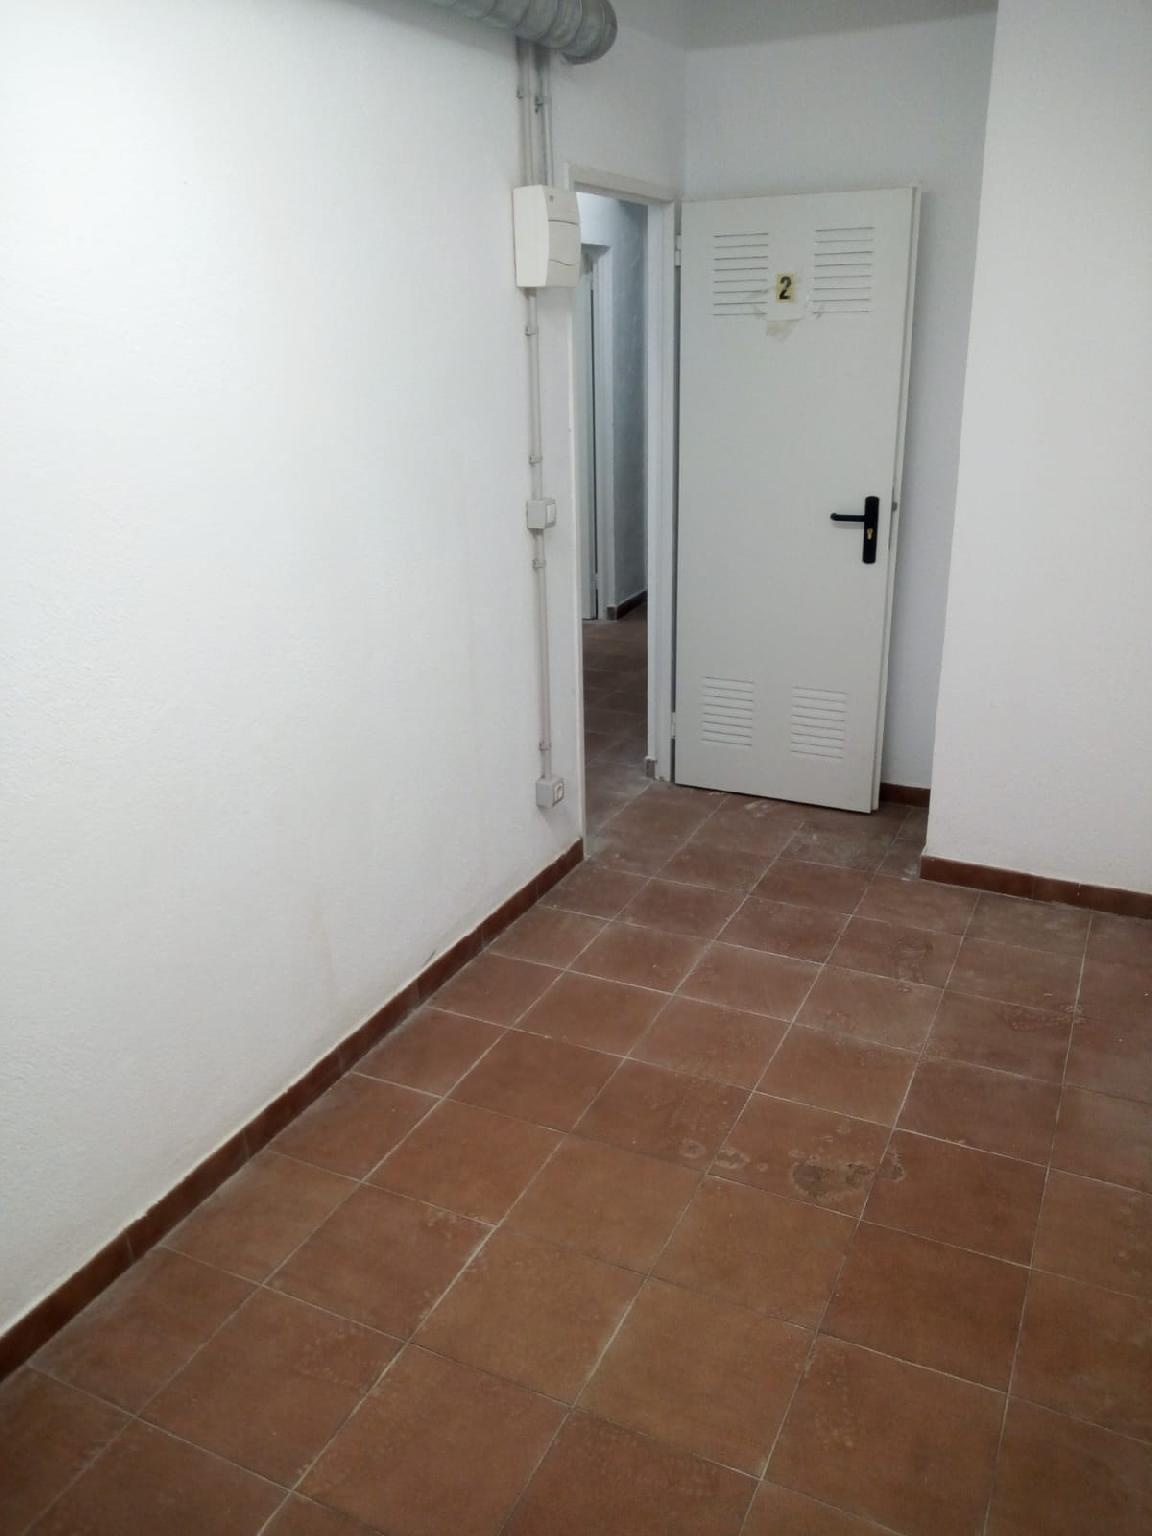 227937 - Zona   Centro